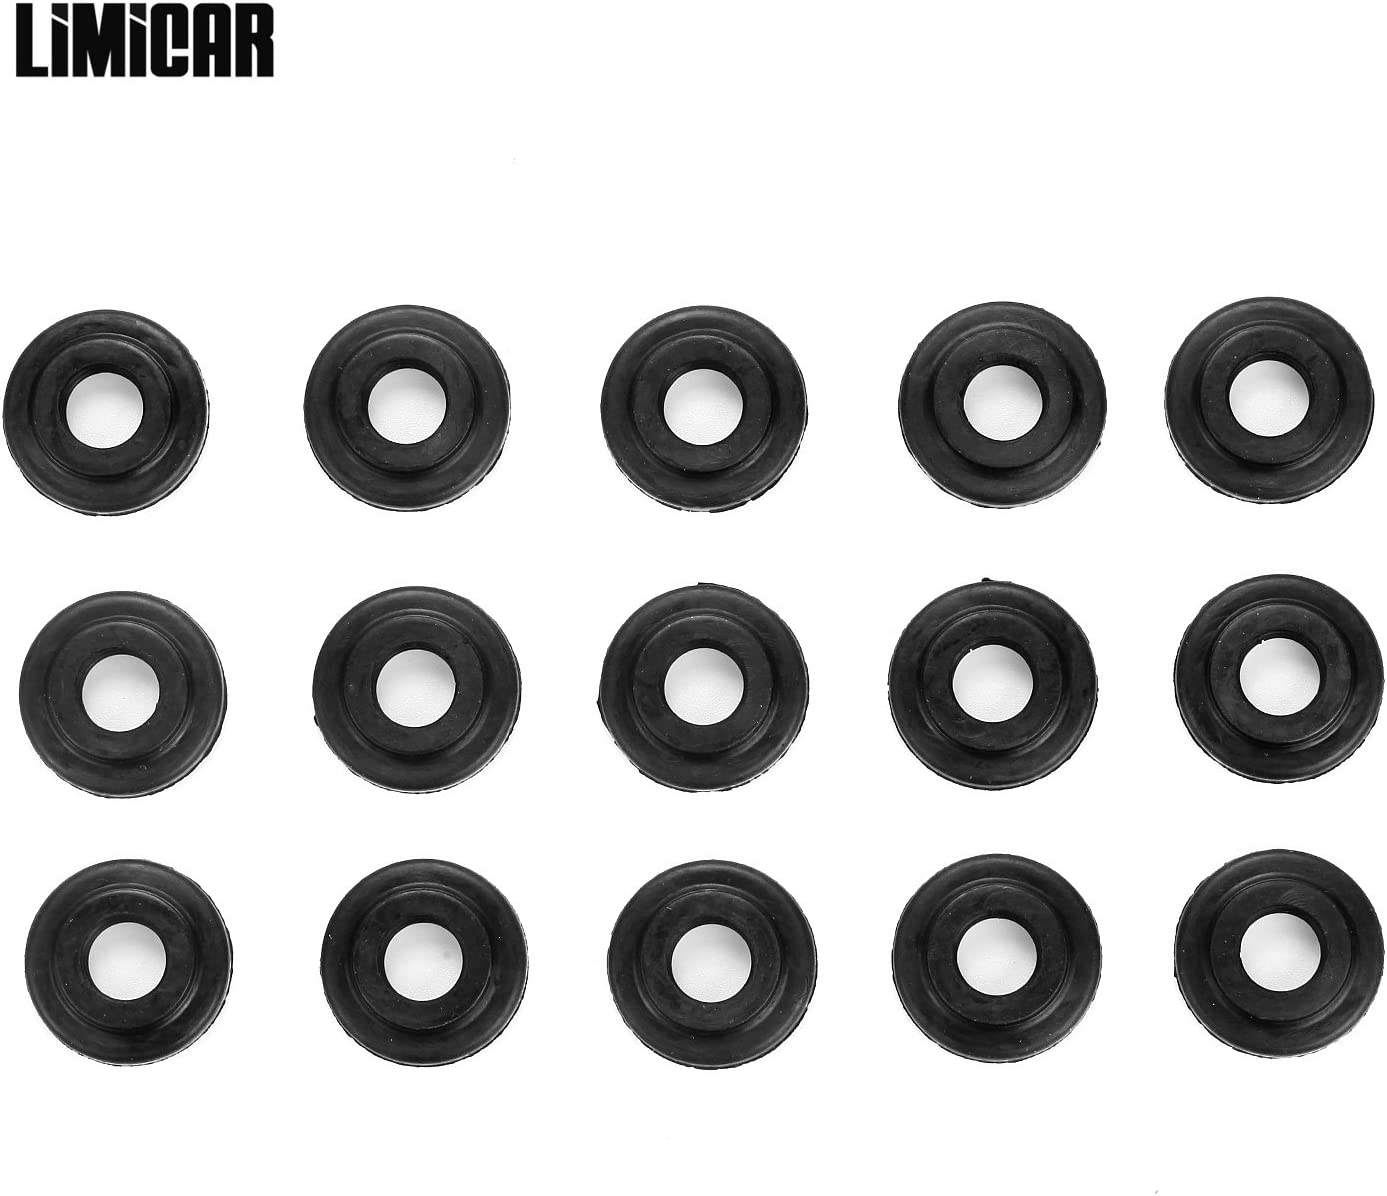 Valve Cover Bolt Seals Grommets fits BMW E36 E46 E60 328i 328ci 2.5L 3.0L Qty 15